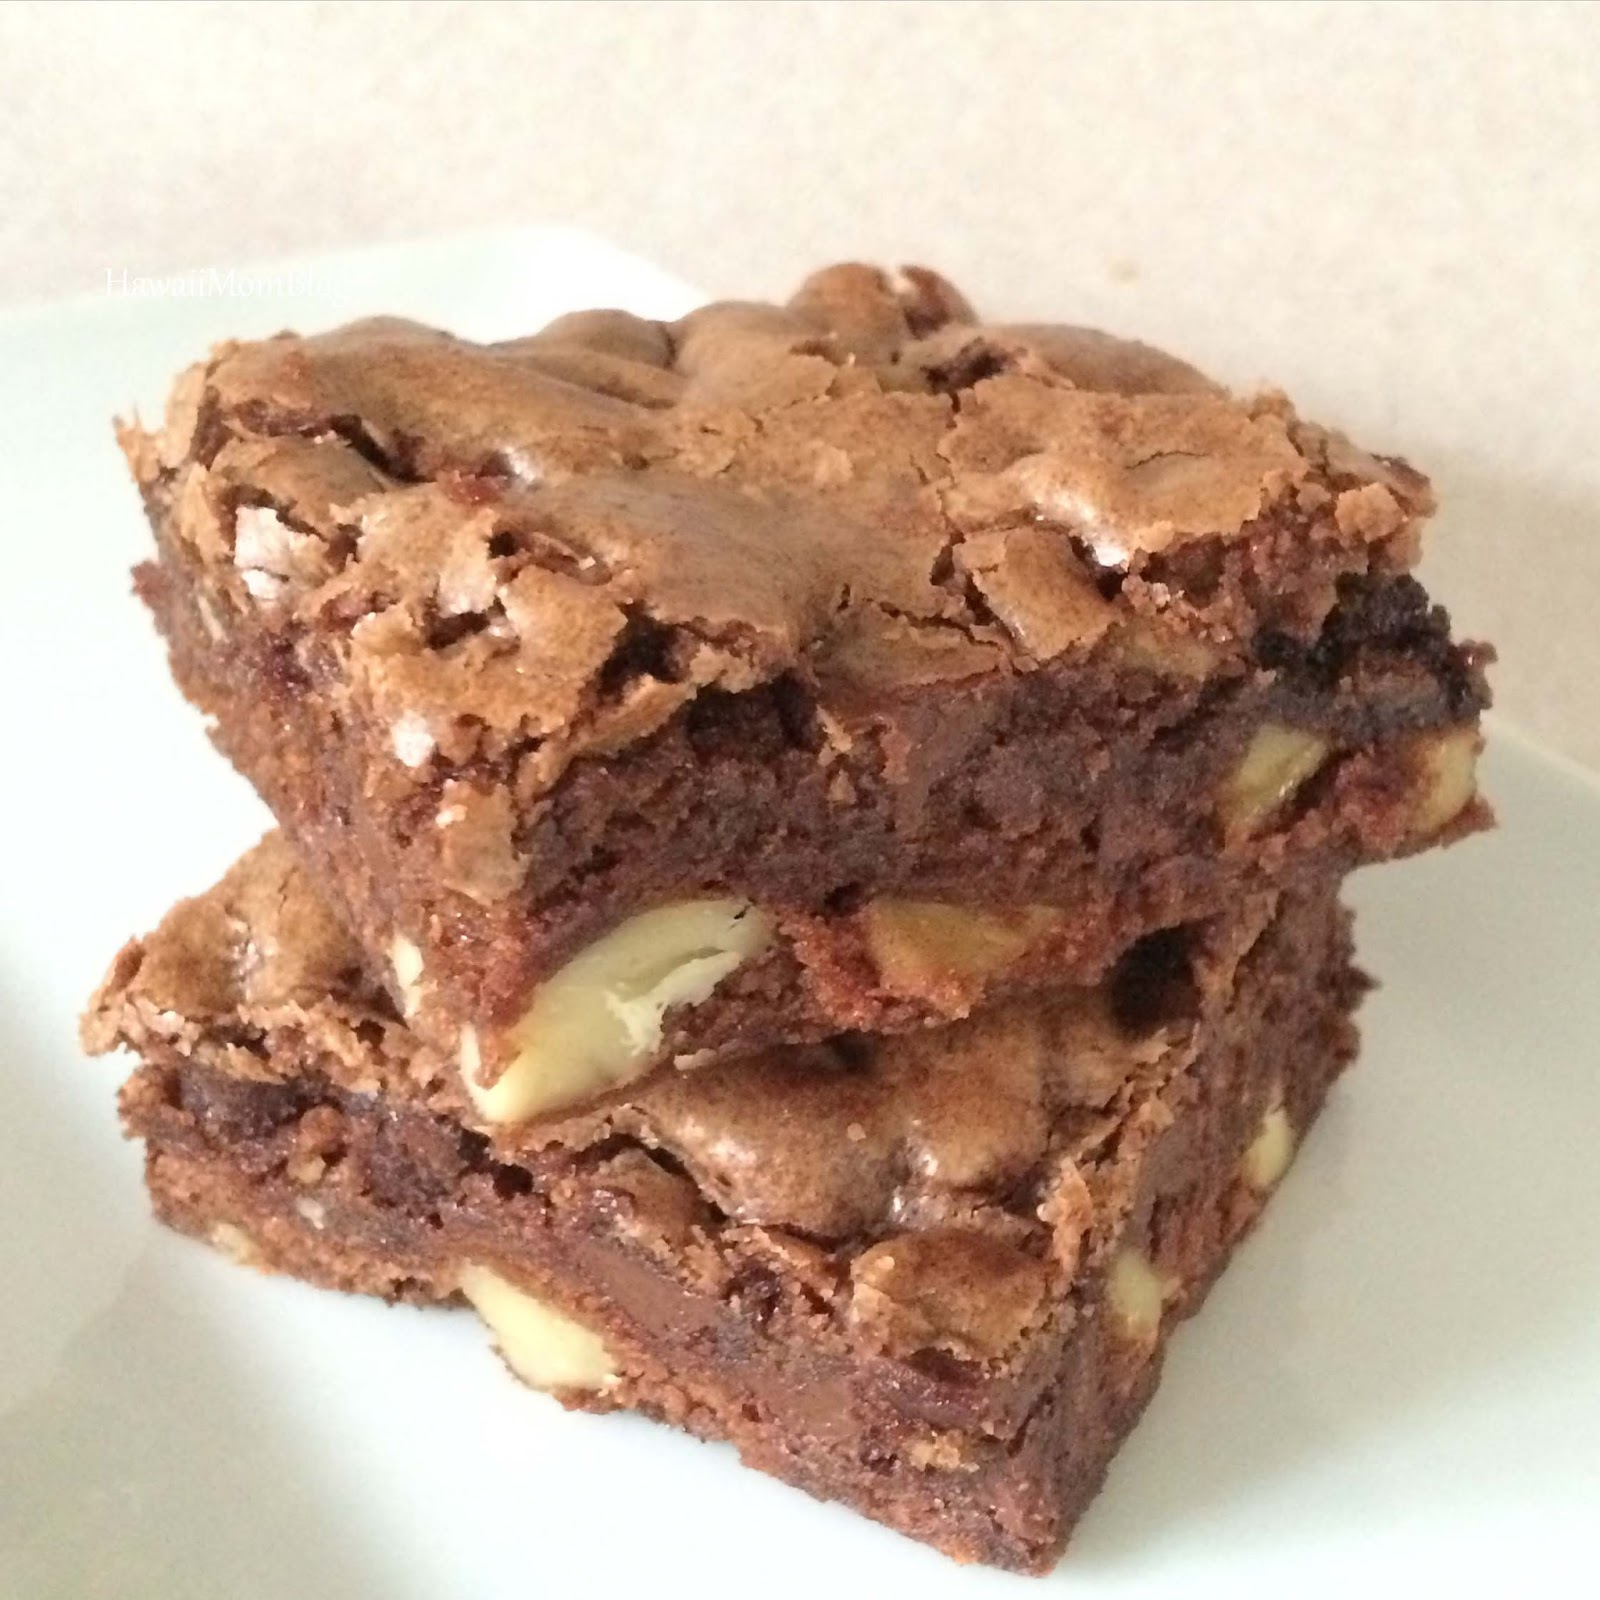 Hawaii Mom Blog: Easy One-Bowl Double Chocolate Chip Brownies Recipe